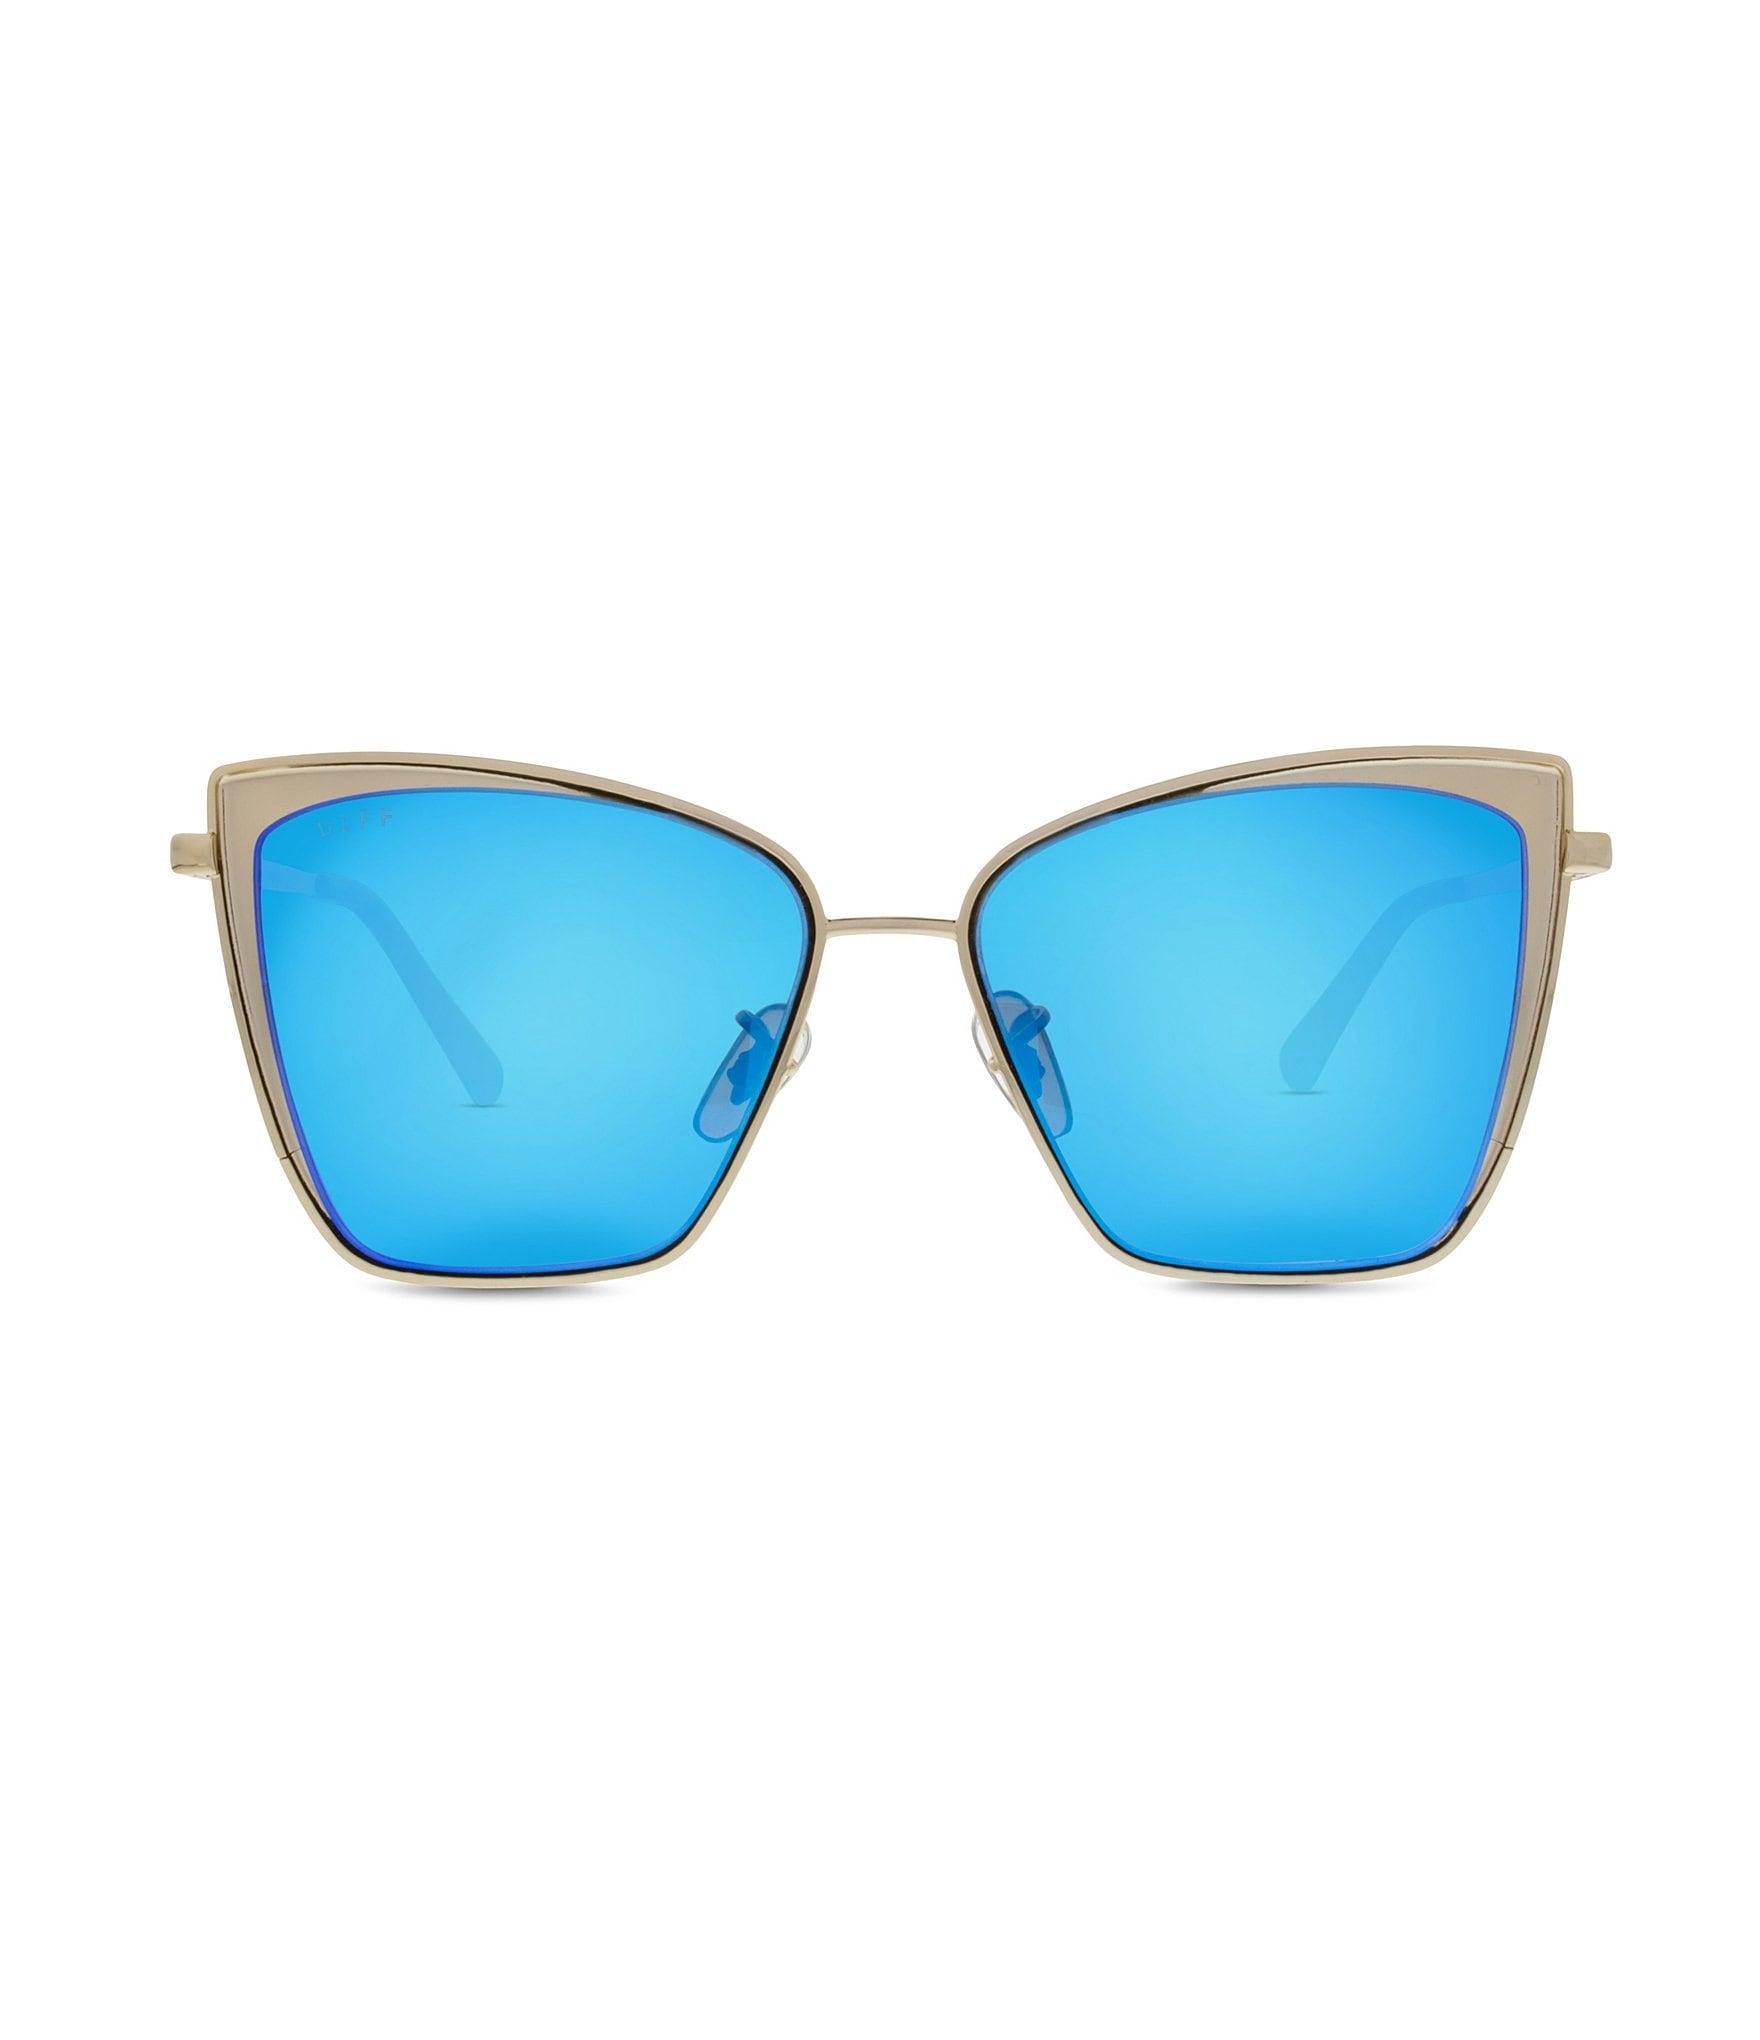 Diff Eyewear Becky Polarized Mirrored Cat Eye Sunglasses